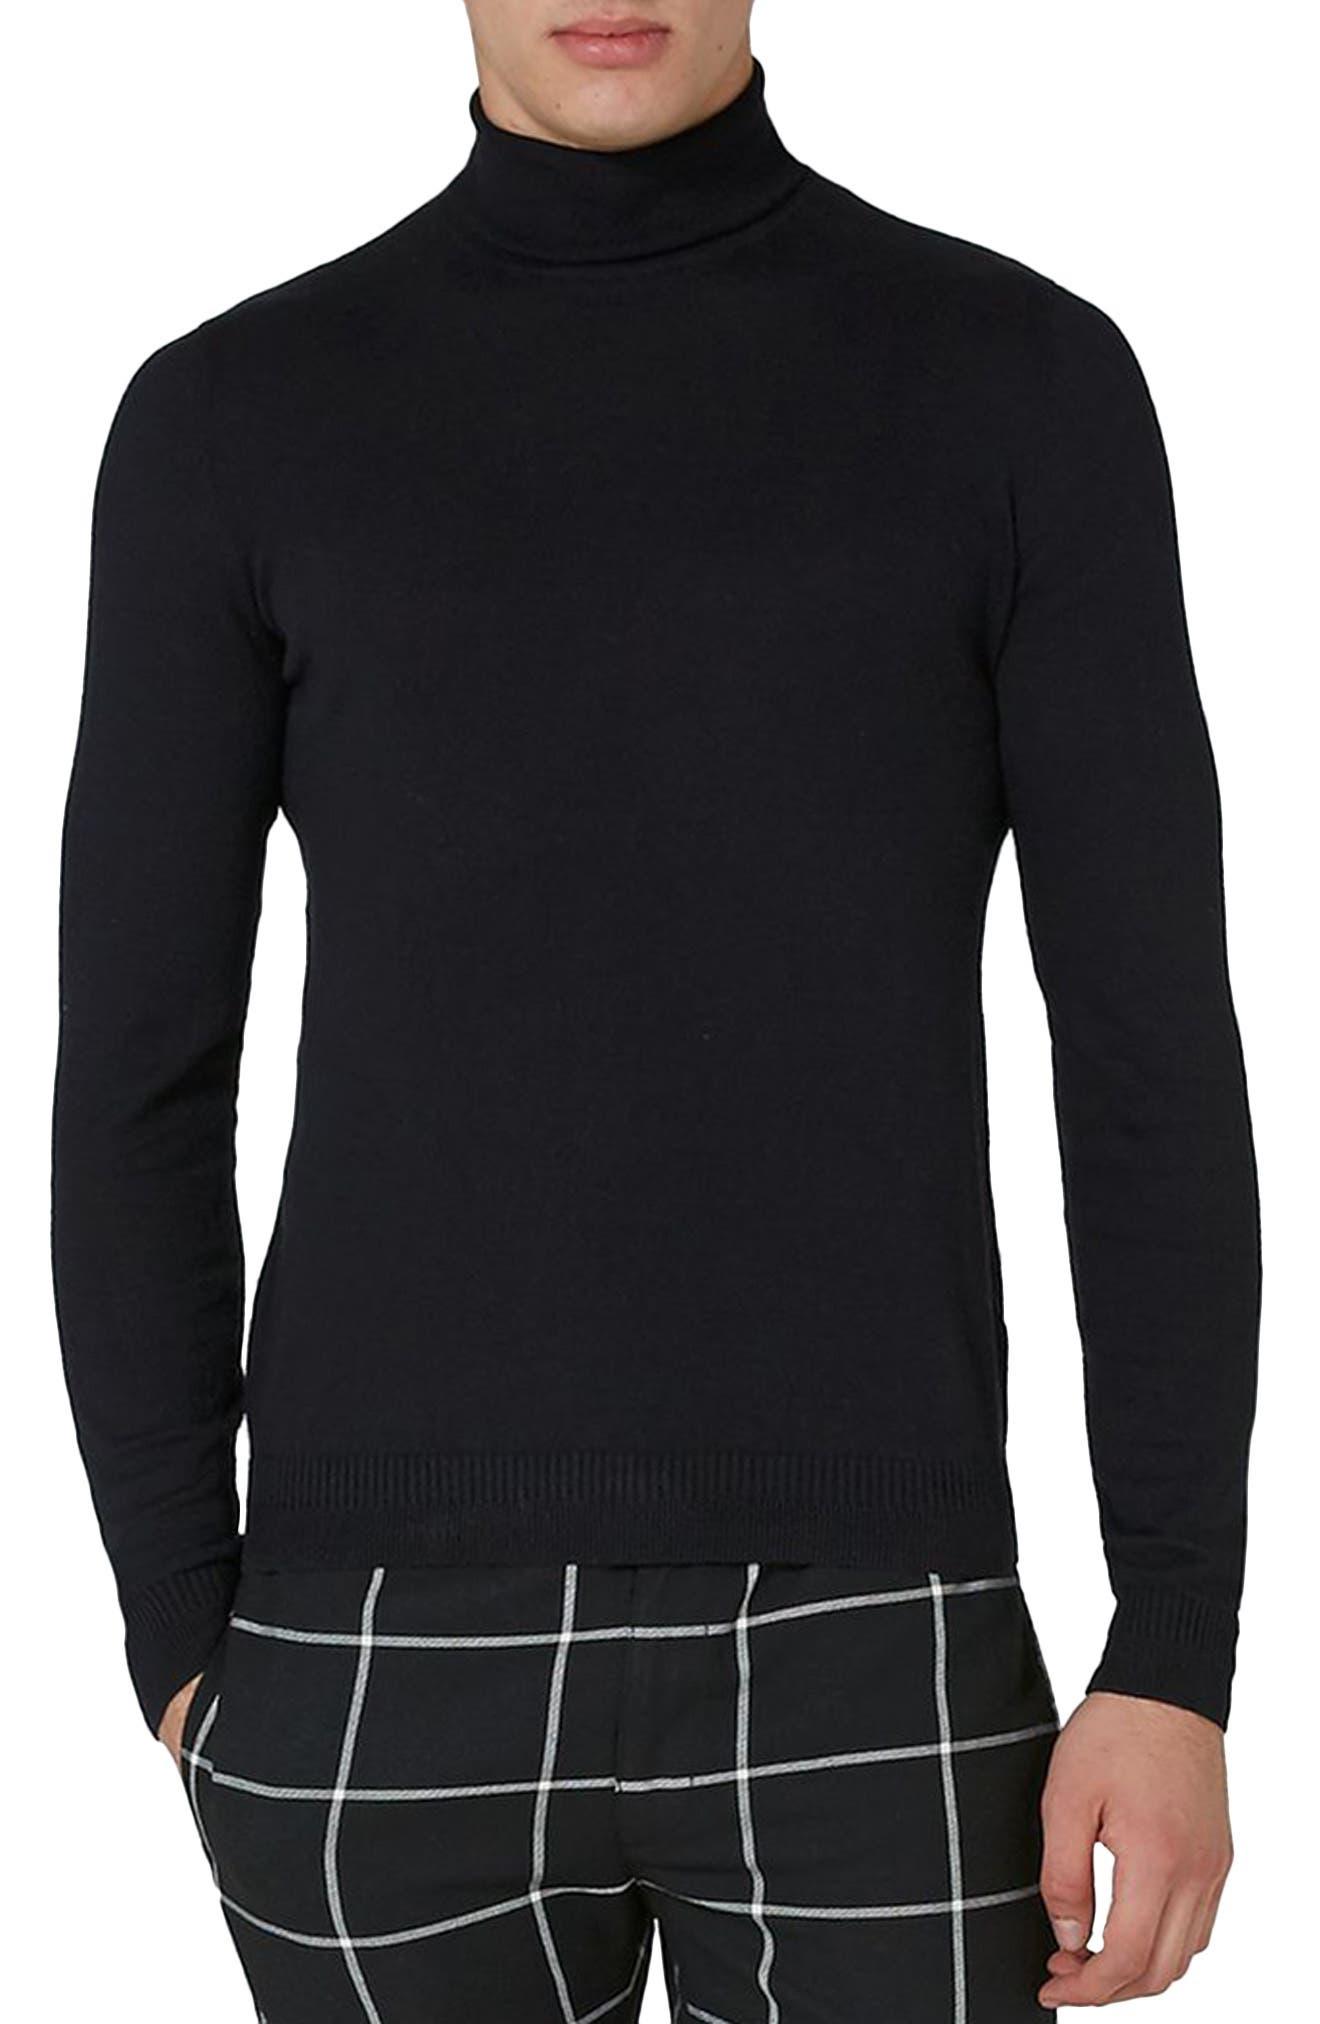 Cotton Turtleneck Sweater,                         Main,                         color, 001